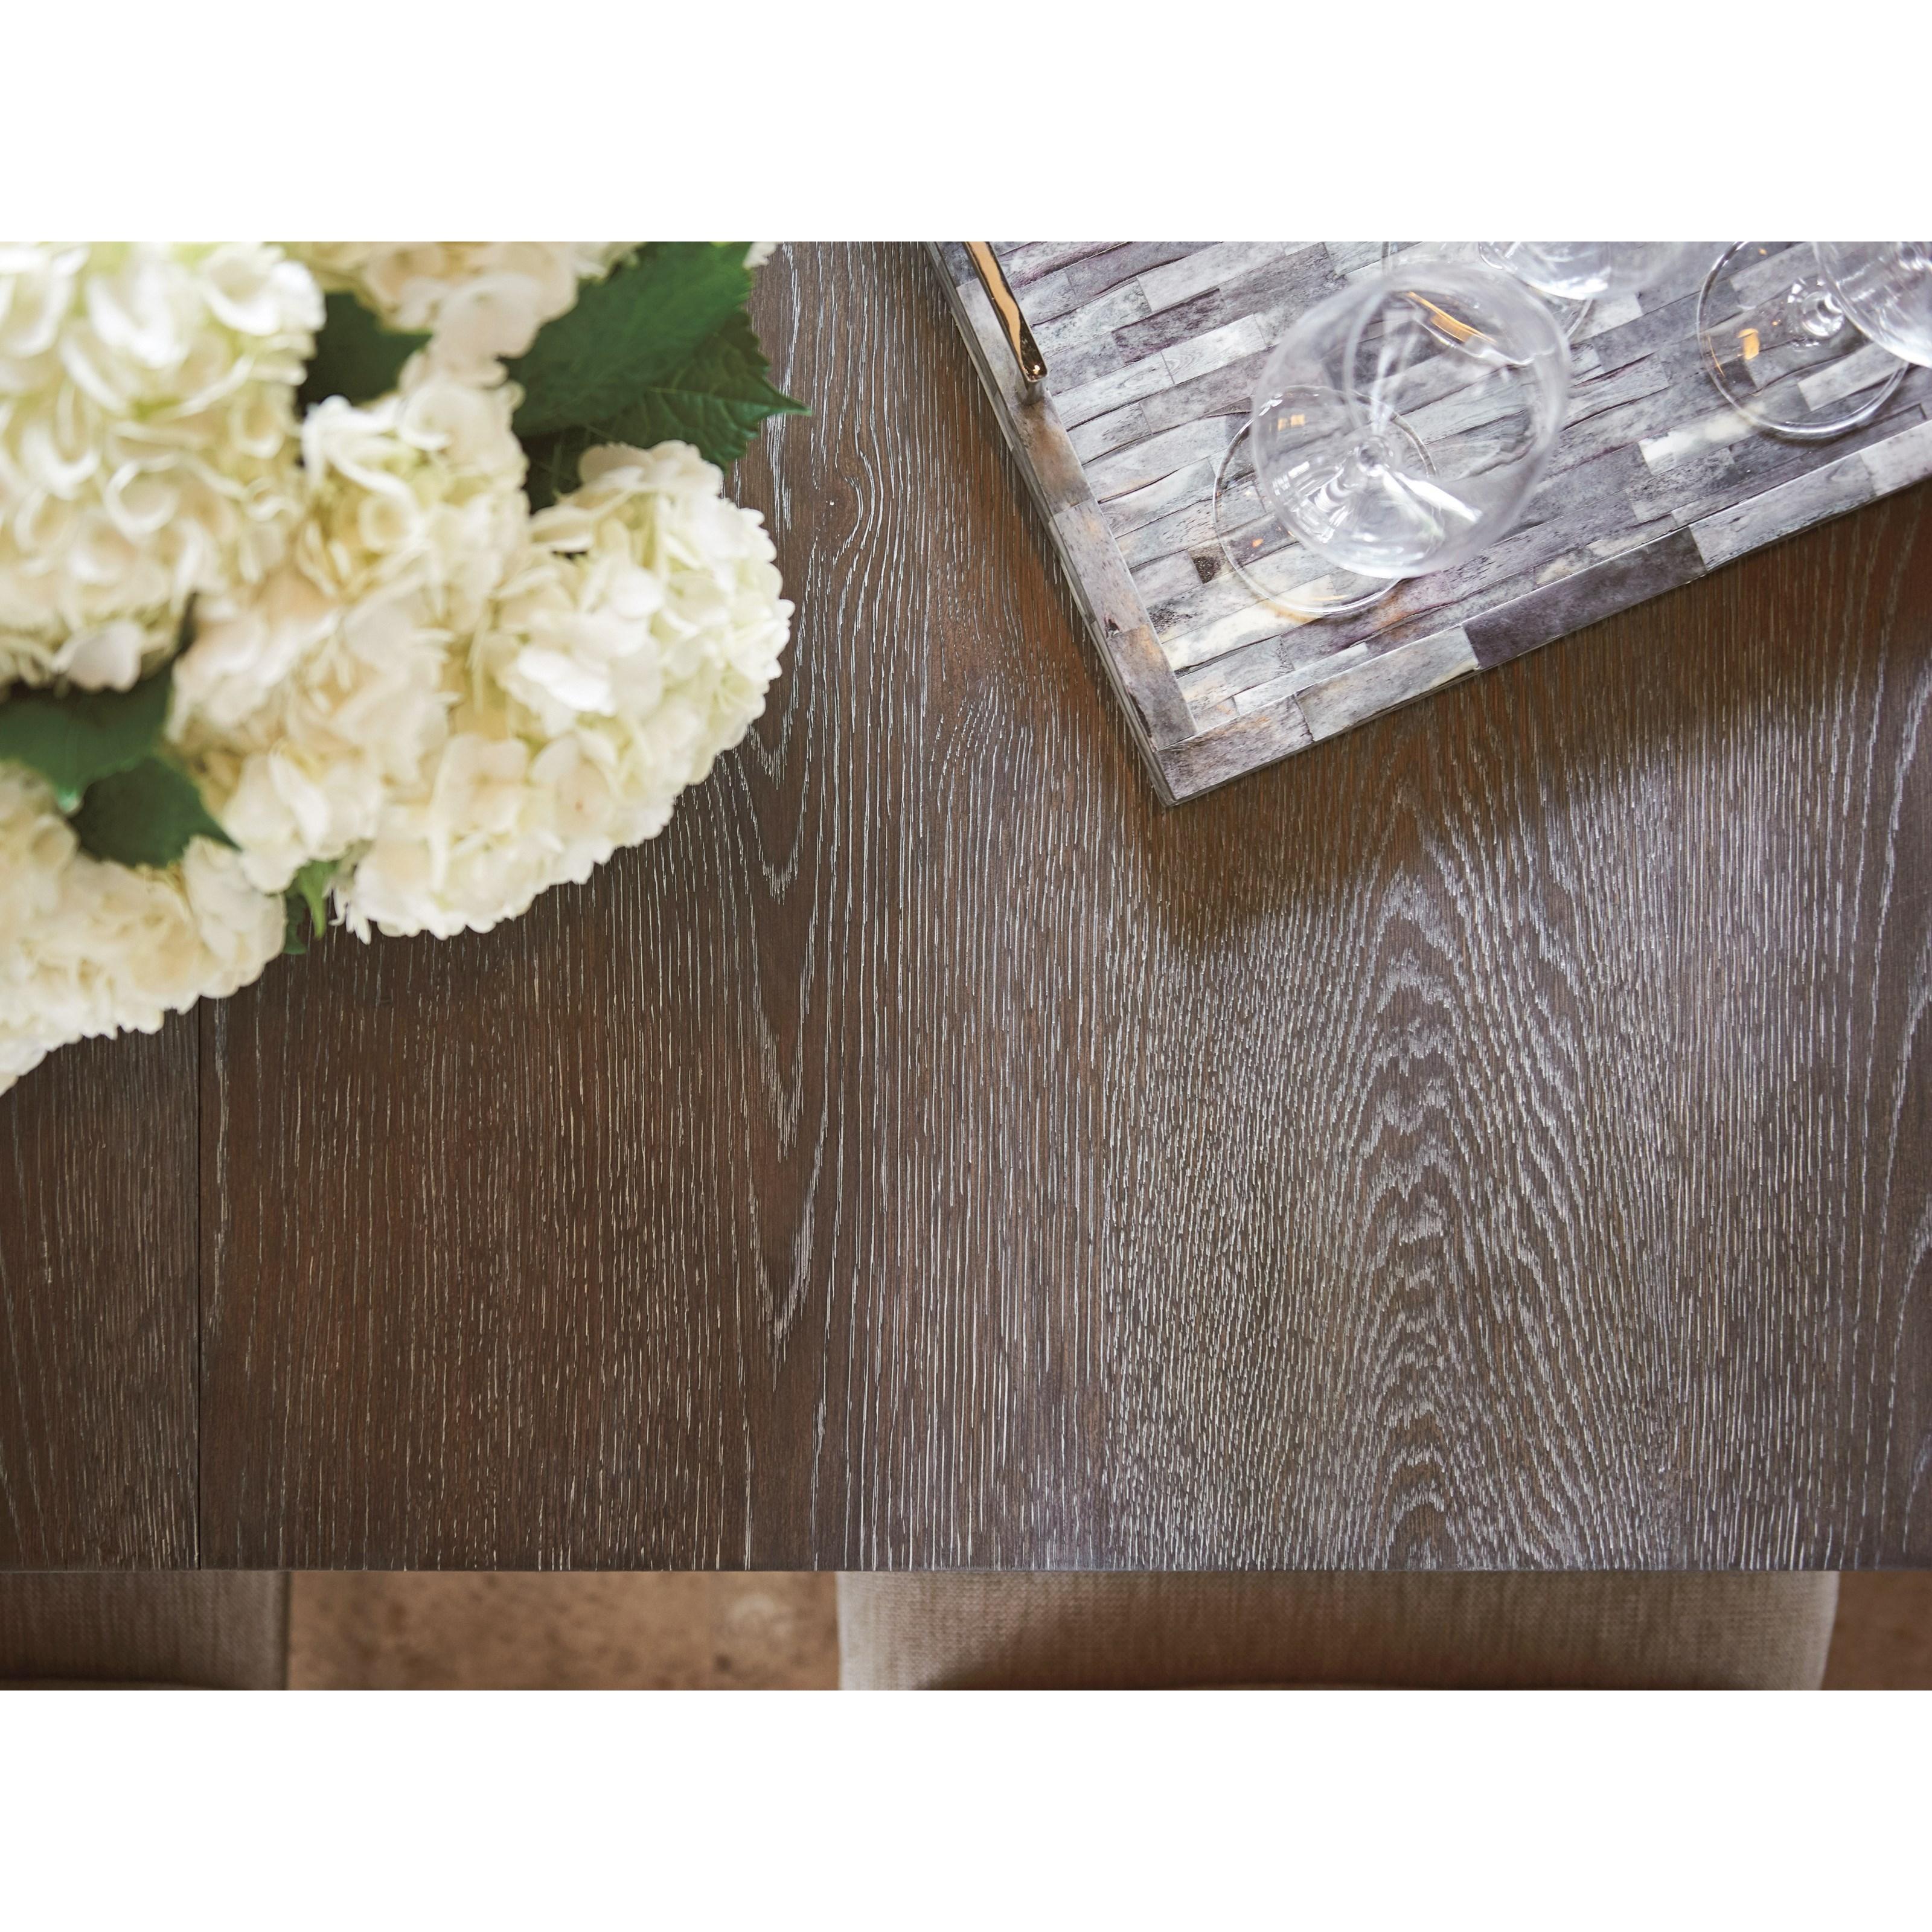 living room sets naples fl vertical blinds for window lexington santana nine piece dining set with marin table ...